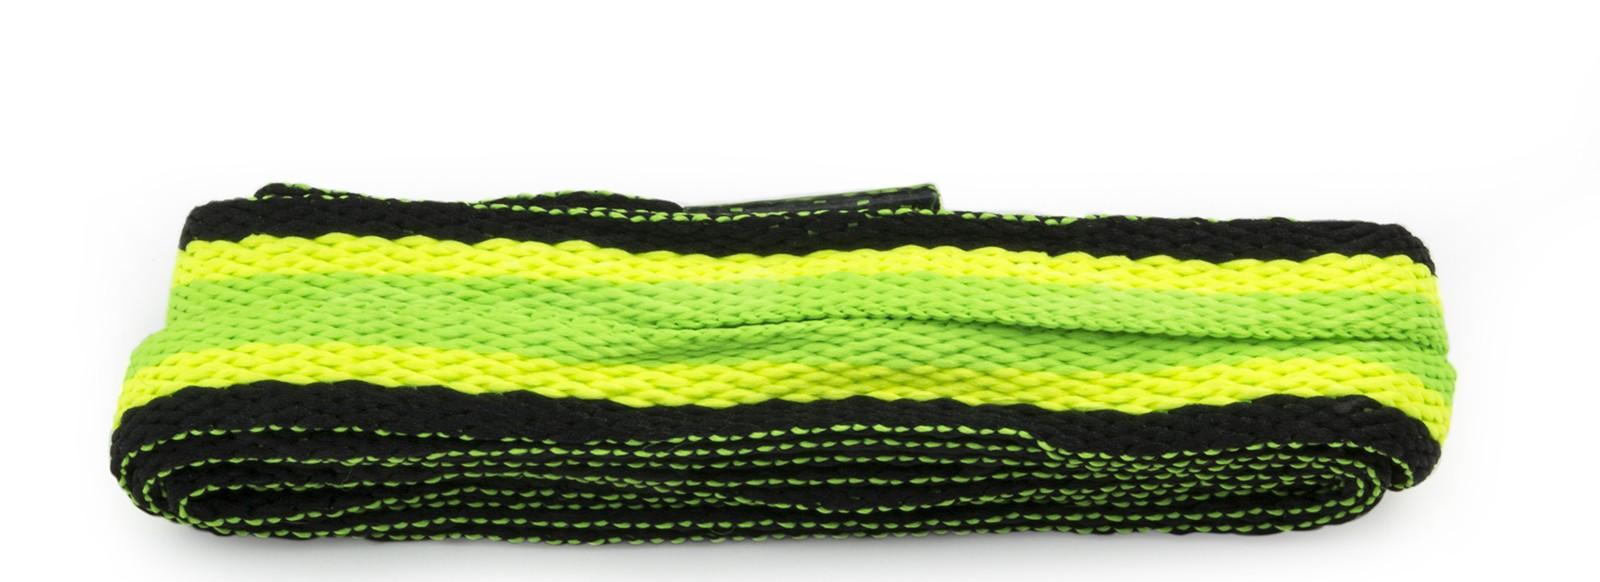 Sneaker Green/yellow/black Stripe